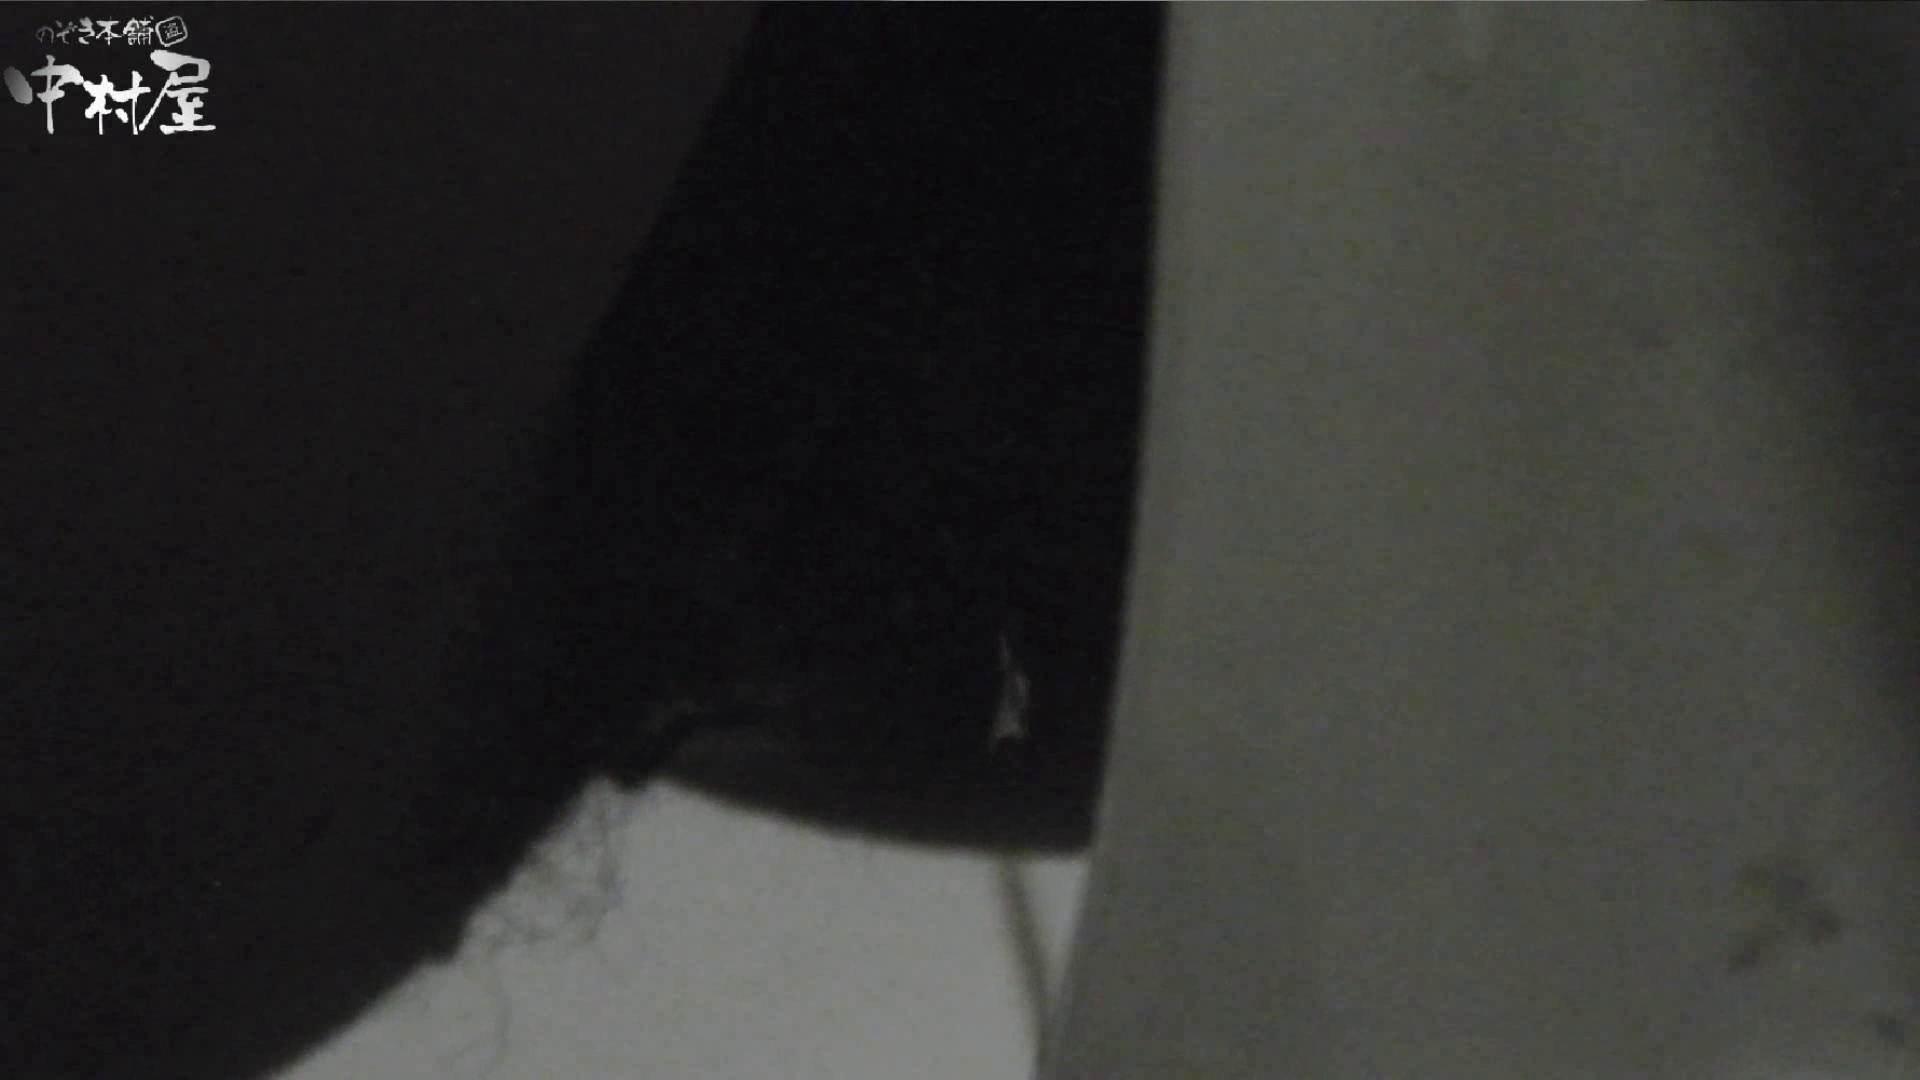 vol.42 命がけ潜伏洗面所! カカト上げながら・硬度強(太)・180g 潜入 | プライベート  101PIX 49